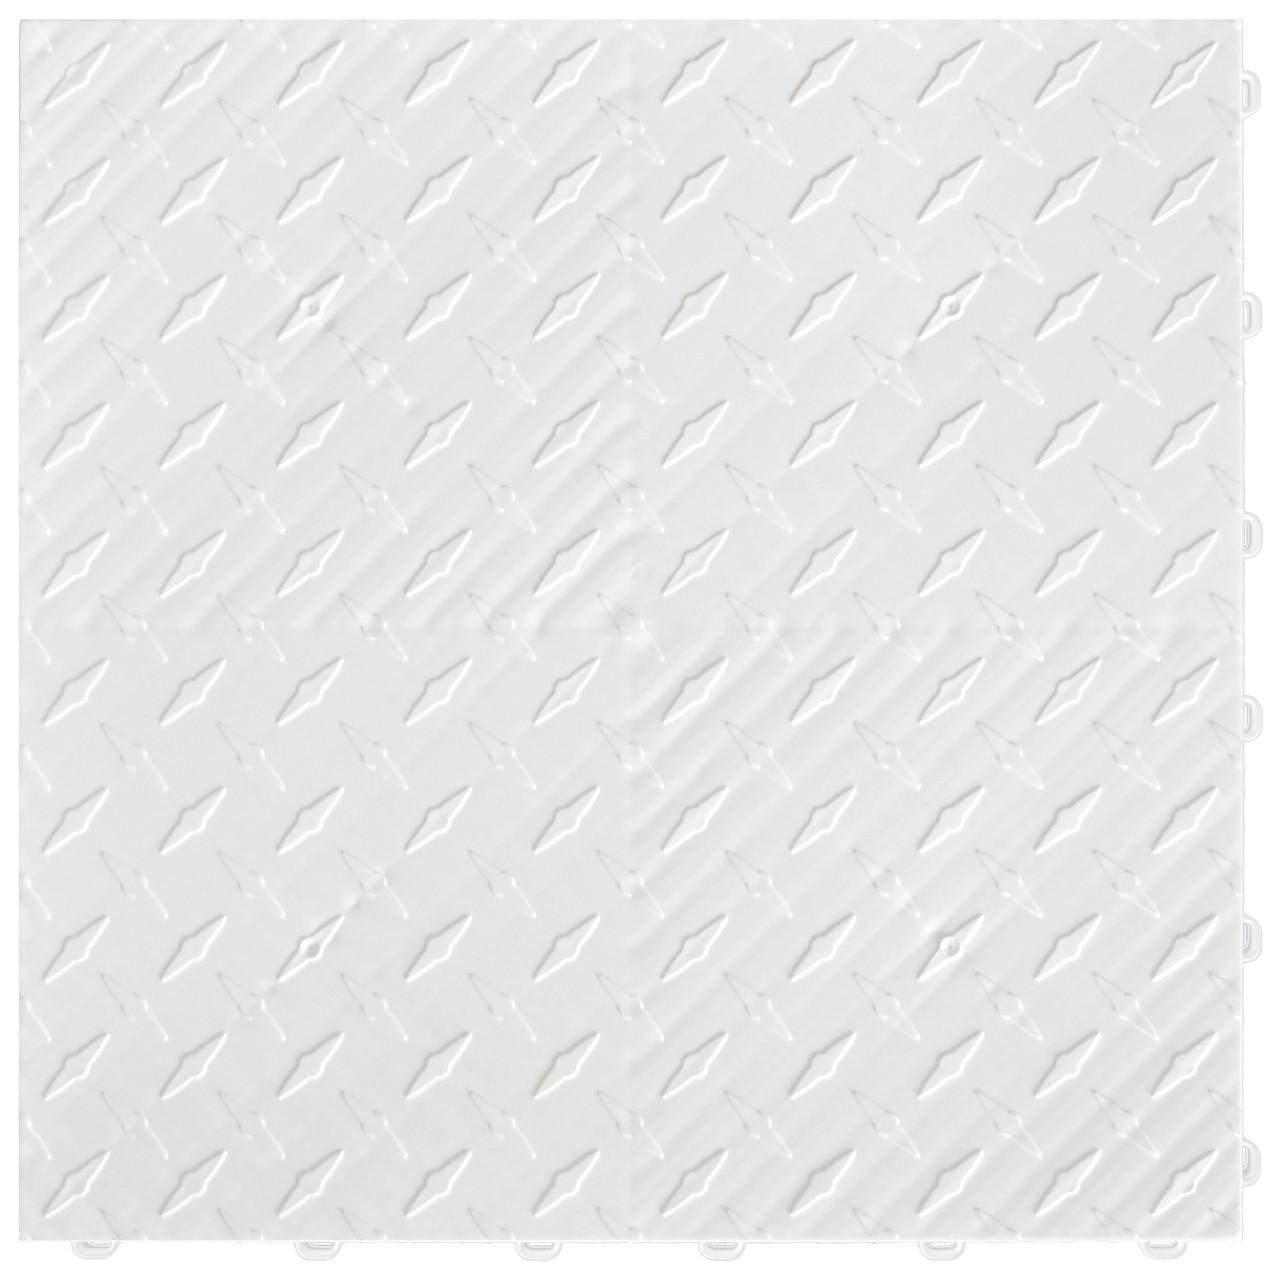 "Arctic White DiamondTrax - SALE PRICE ONLY $3.96 PER SQ FT Tile Size: 15.75"" x 15.75"" x .75 (1 Tile = 1.72 sq ft)"